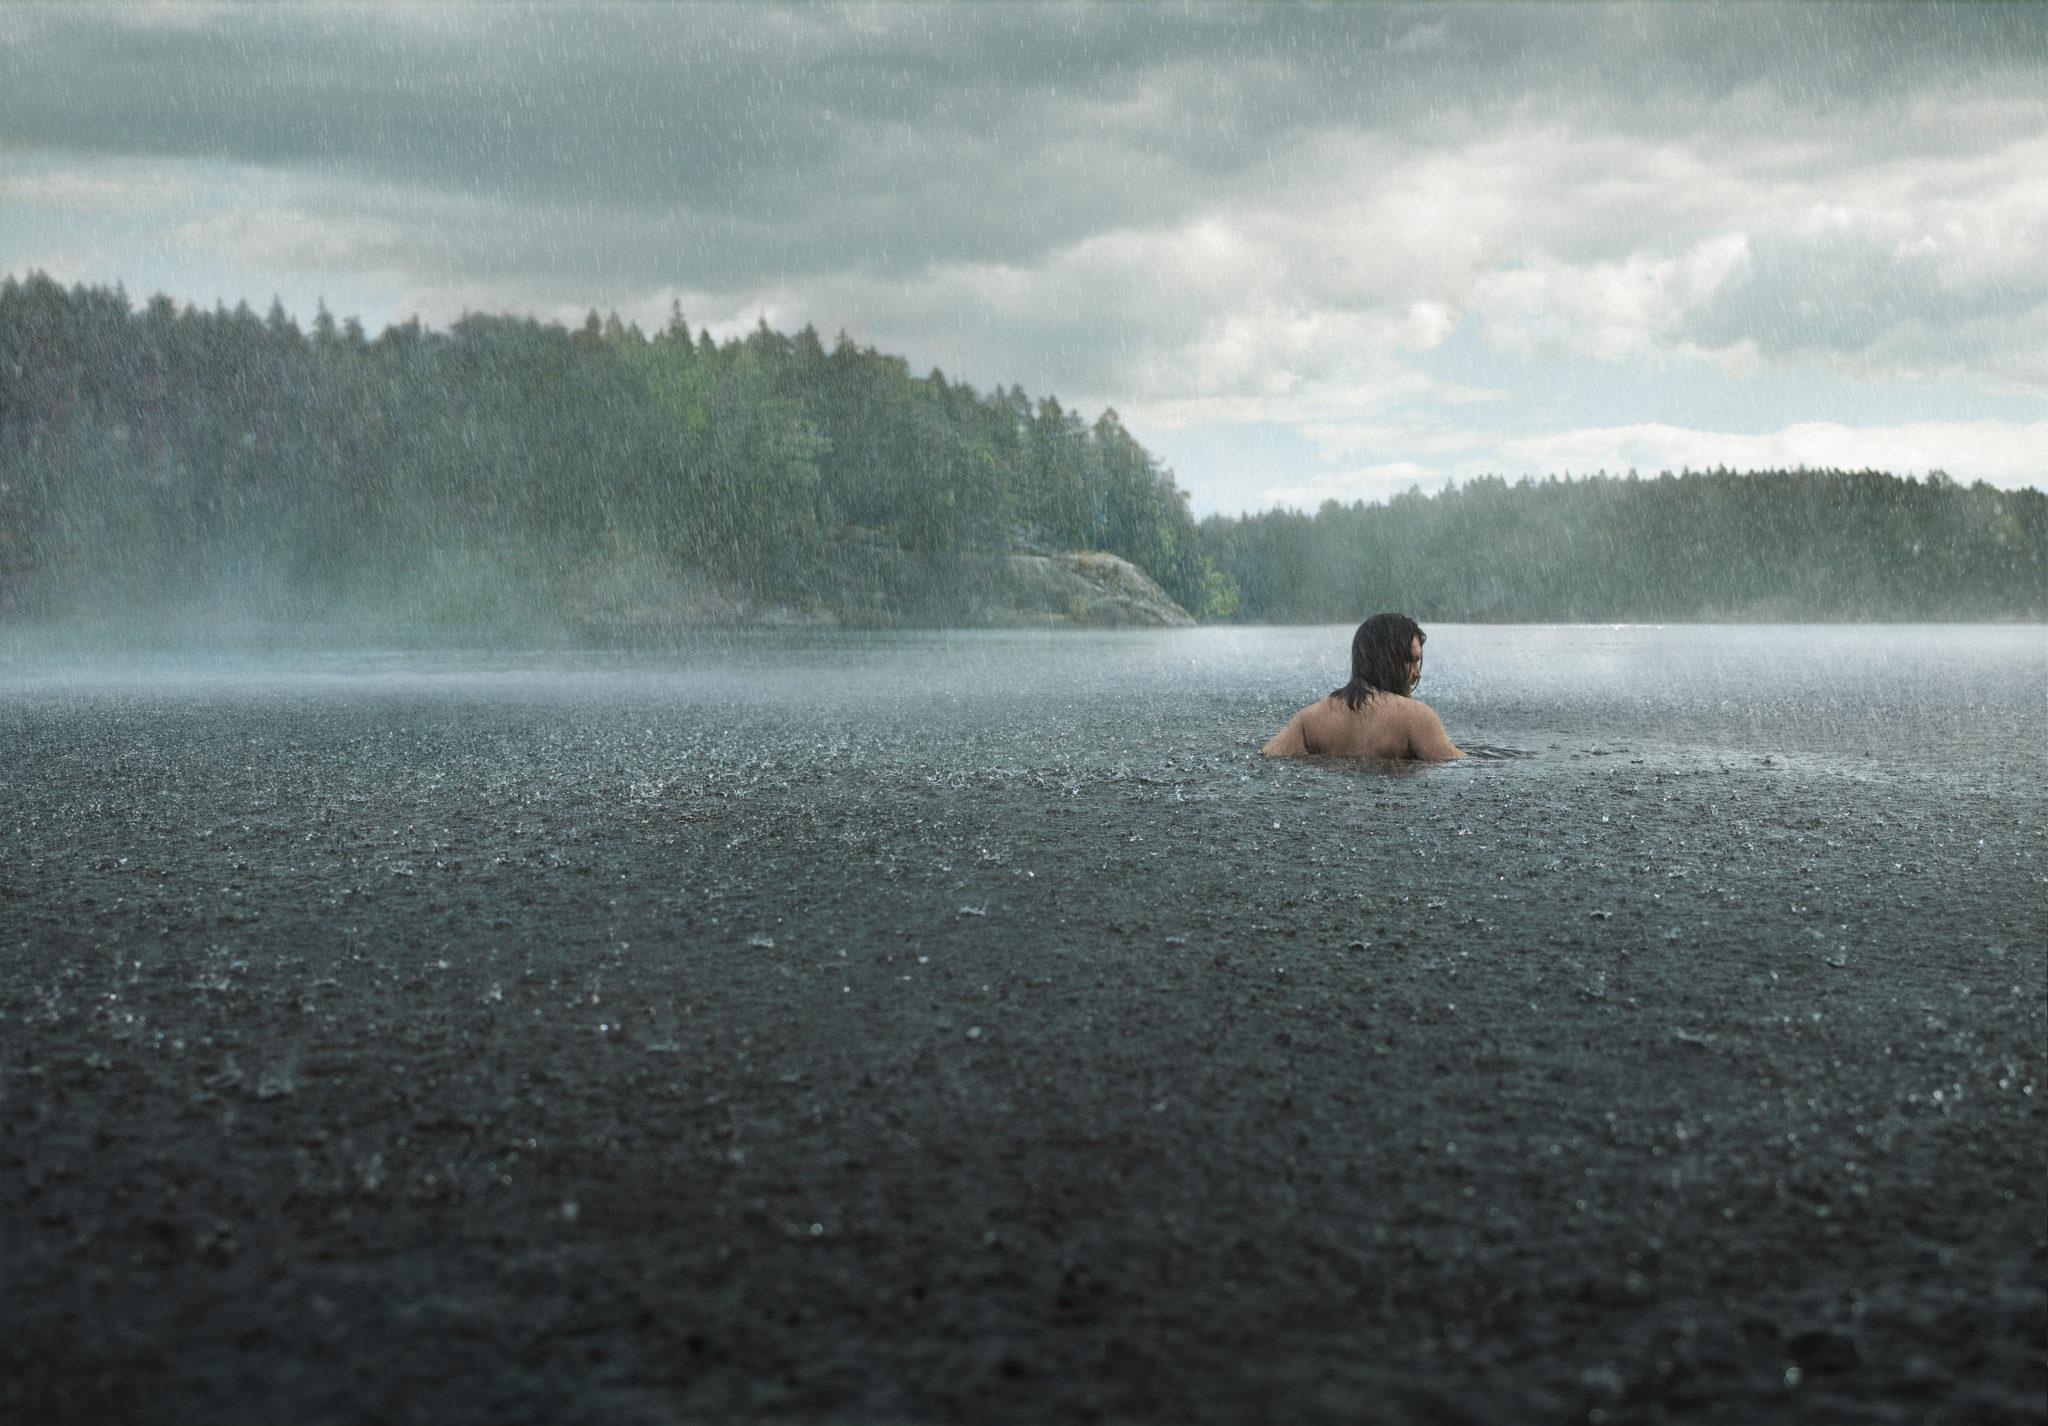 4298_Finlandia_Lake_Man_r6_Full